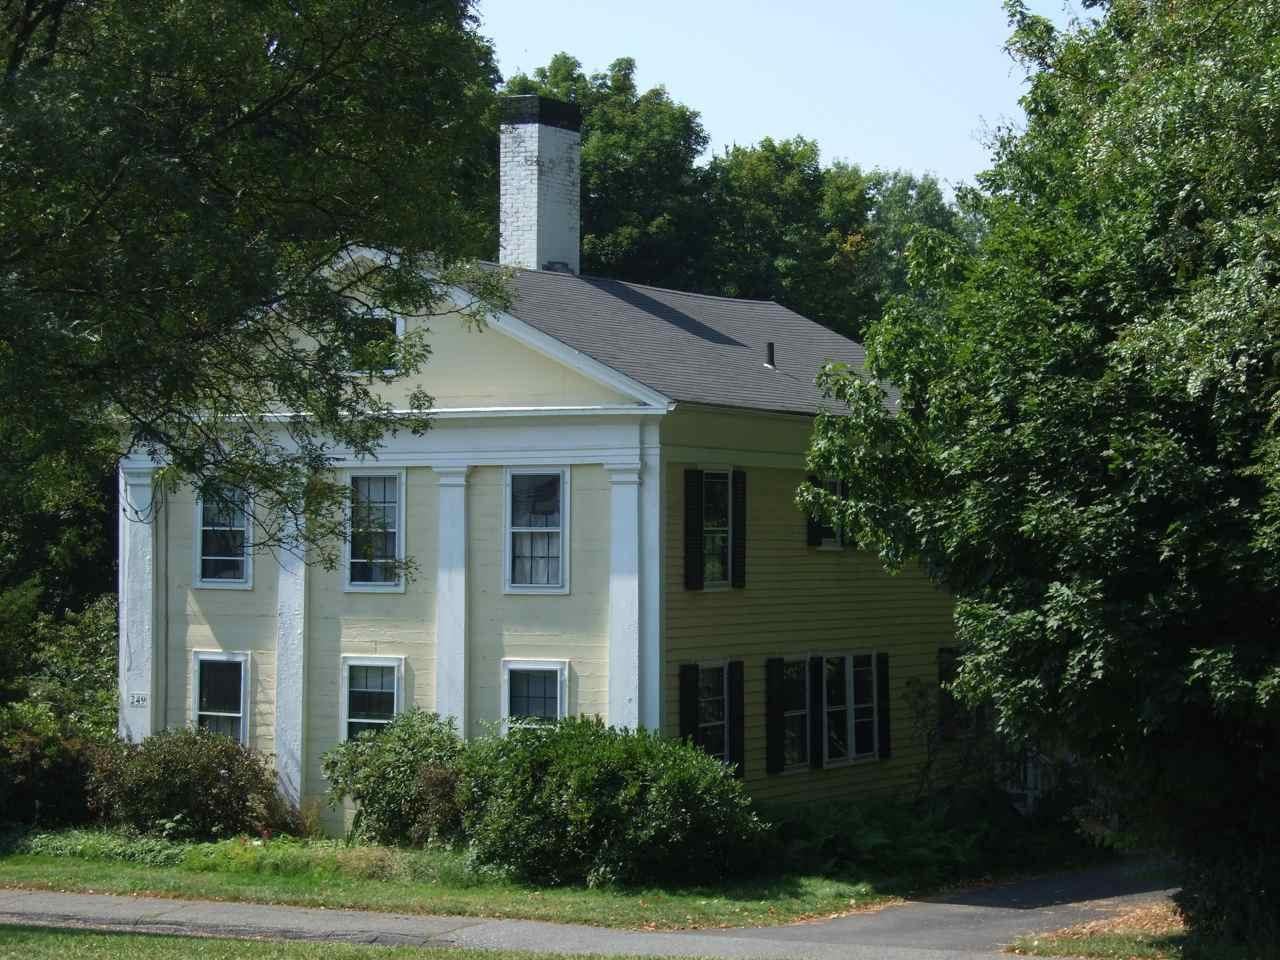 http://3.bp.blogspot.com/_5djC8kTaKss/TLkwstLjuNI/AAAAAAAADXc/nCDJxsql_EI/s1600/Helen+Hunt+Jackson+House.jpg